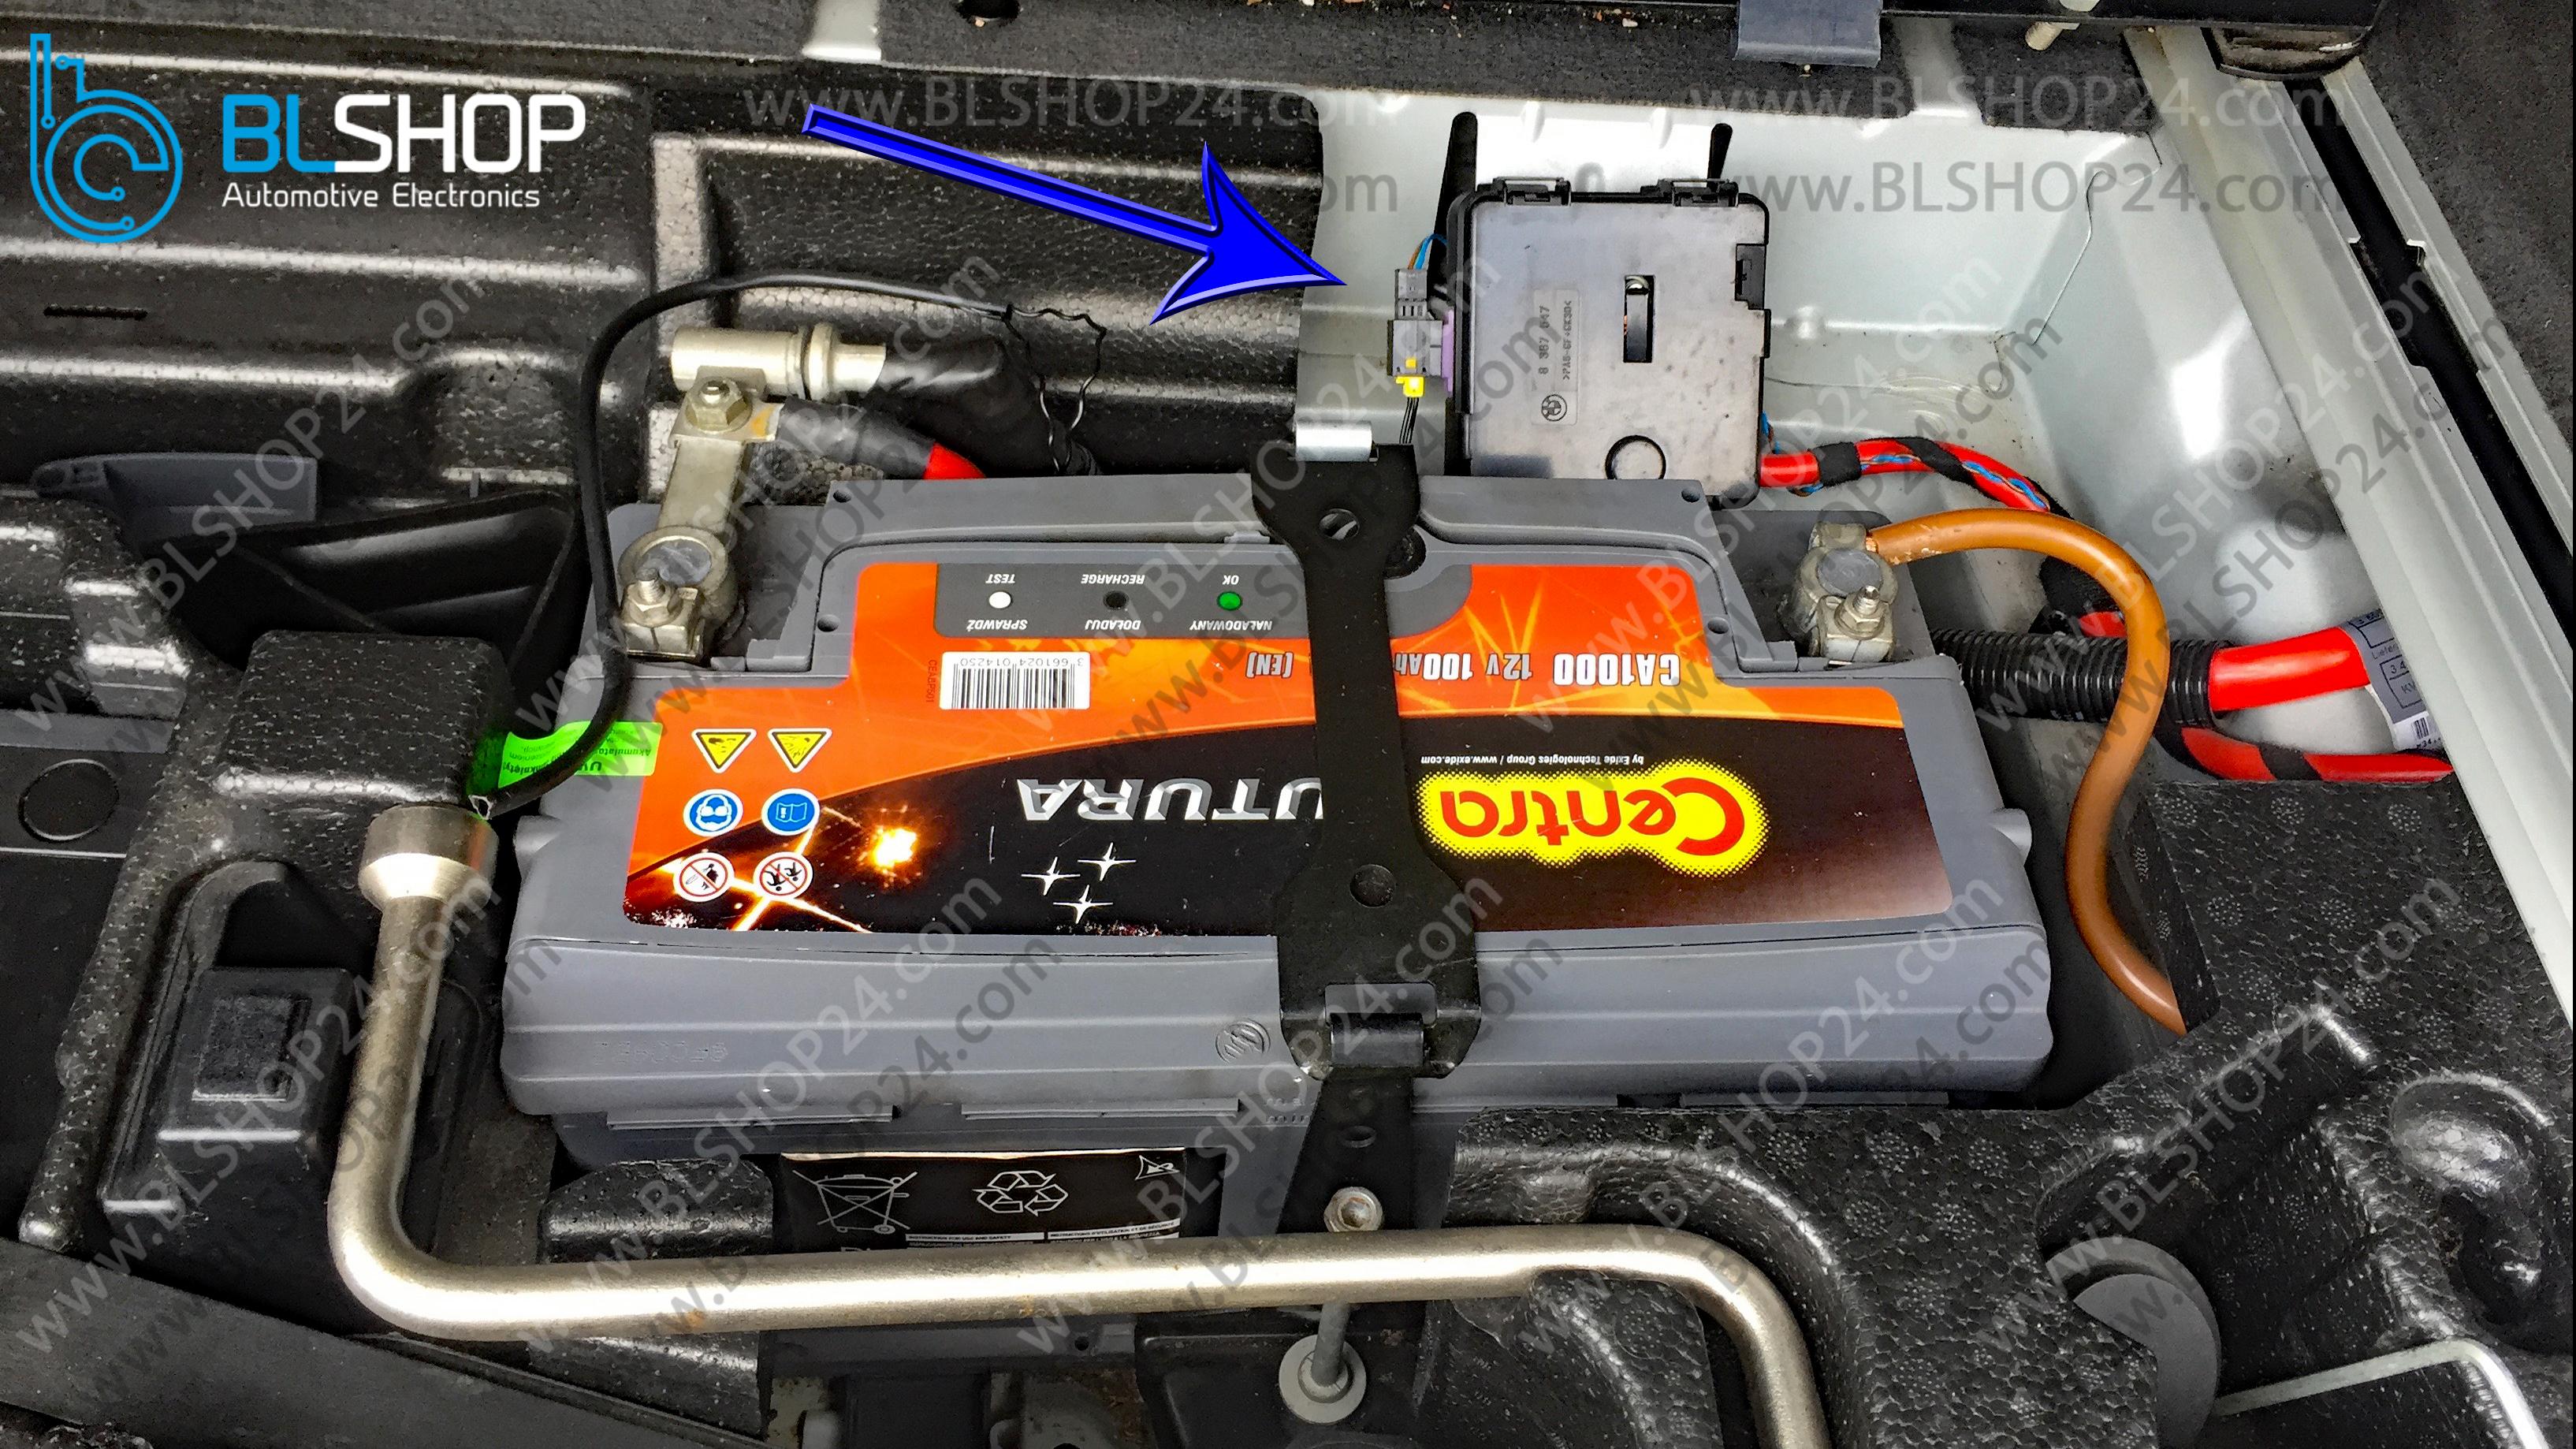 Battery Safety Terminal emulator installation - Step 1